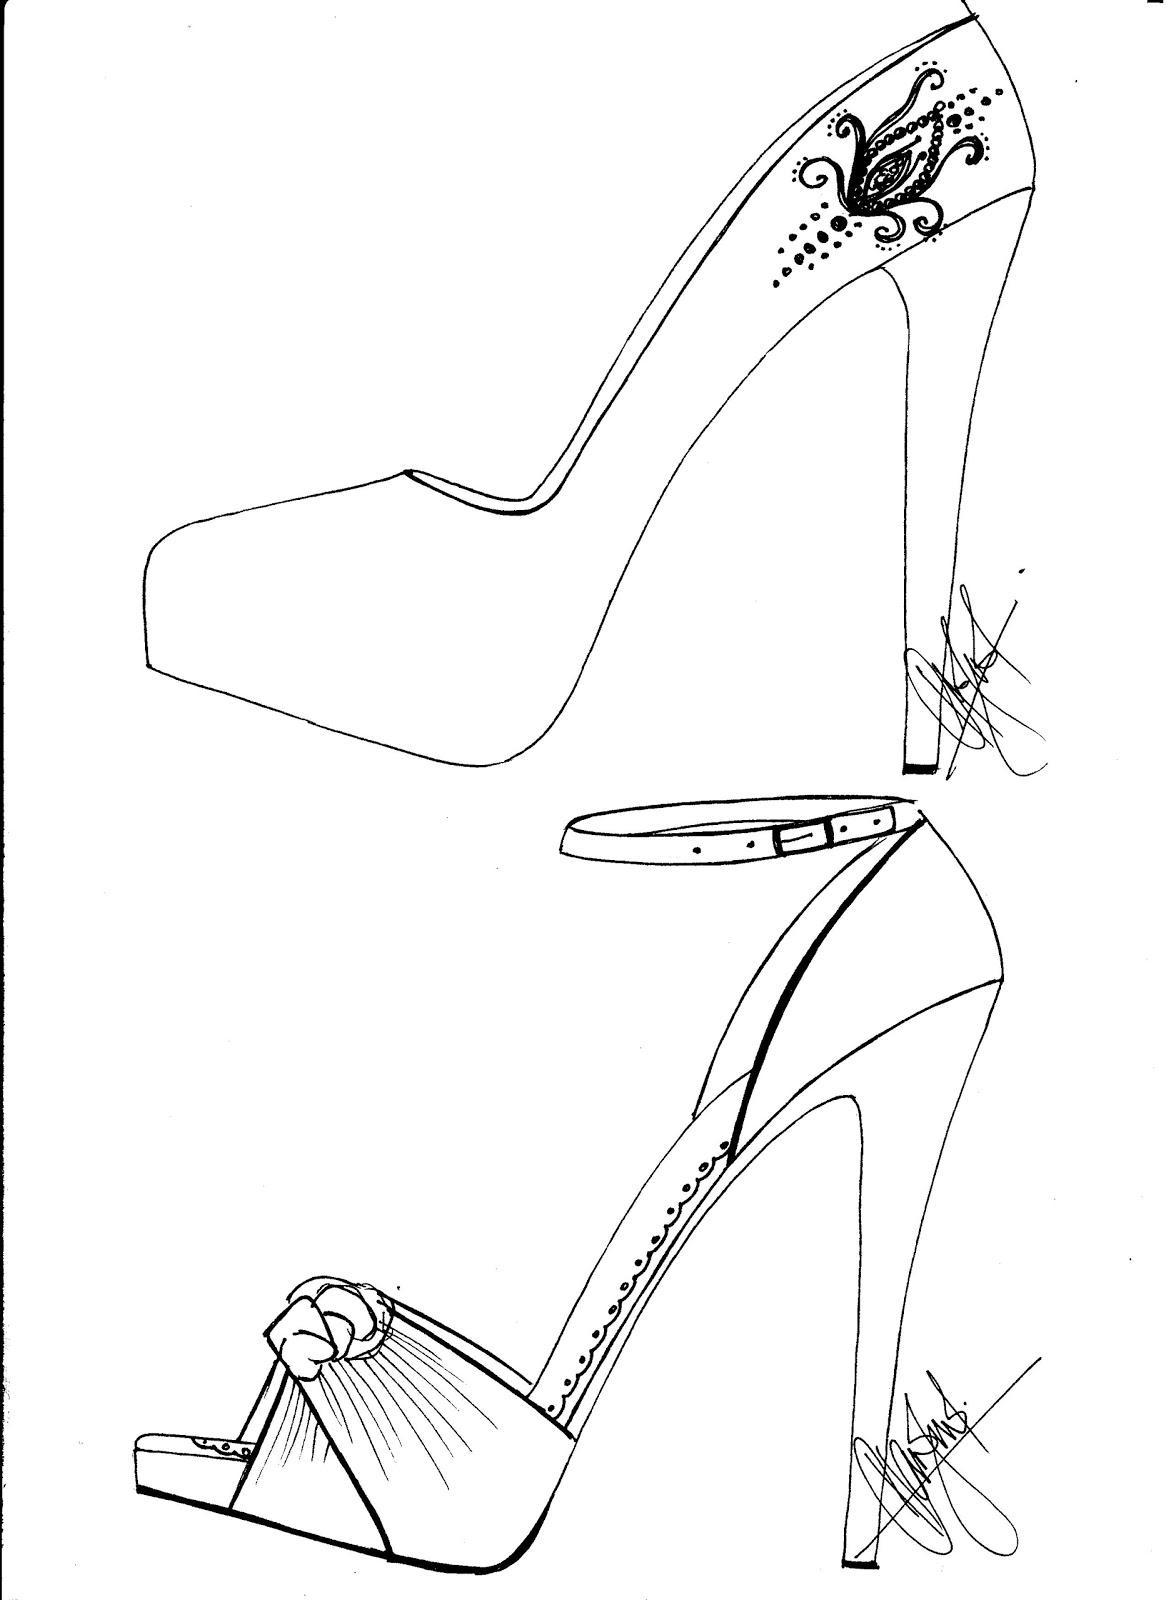 how to sketch high heels high heel drawing by dapopdude on deviantart sketch to how heels high